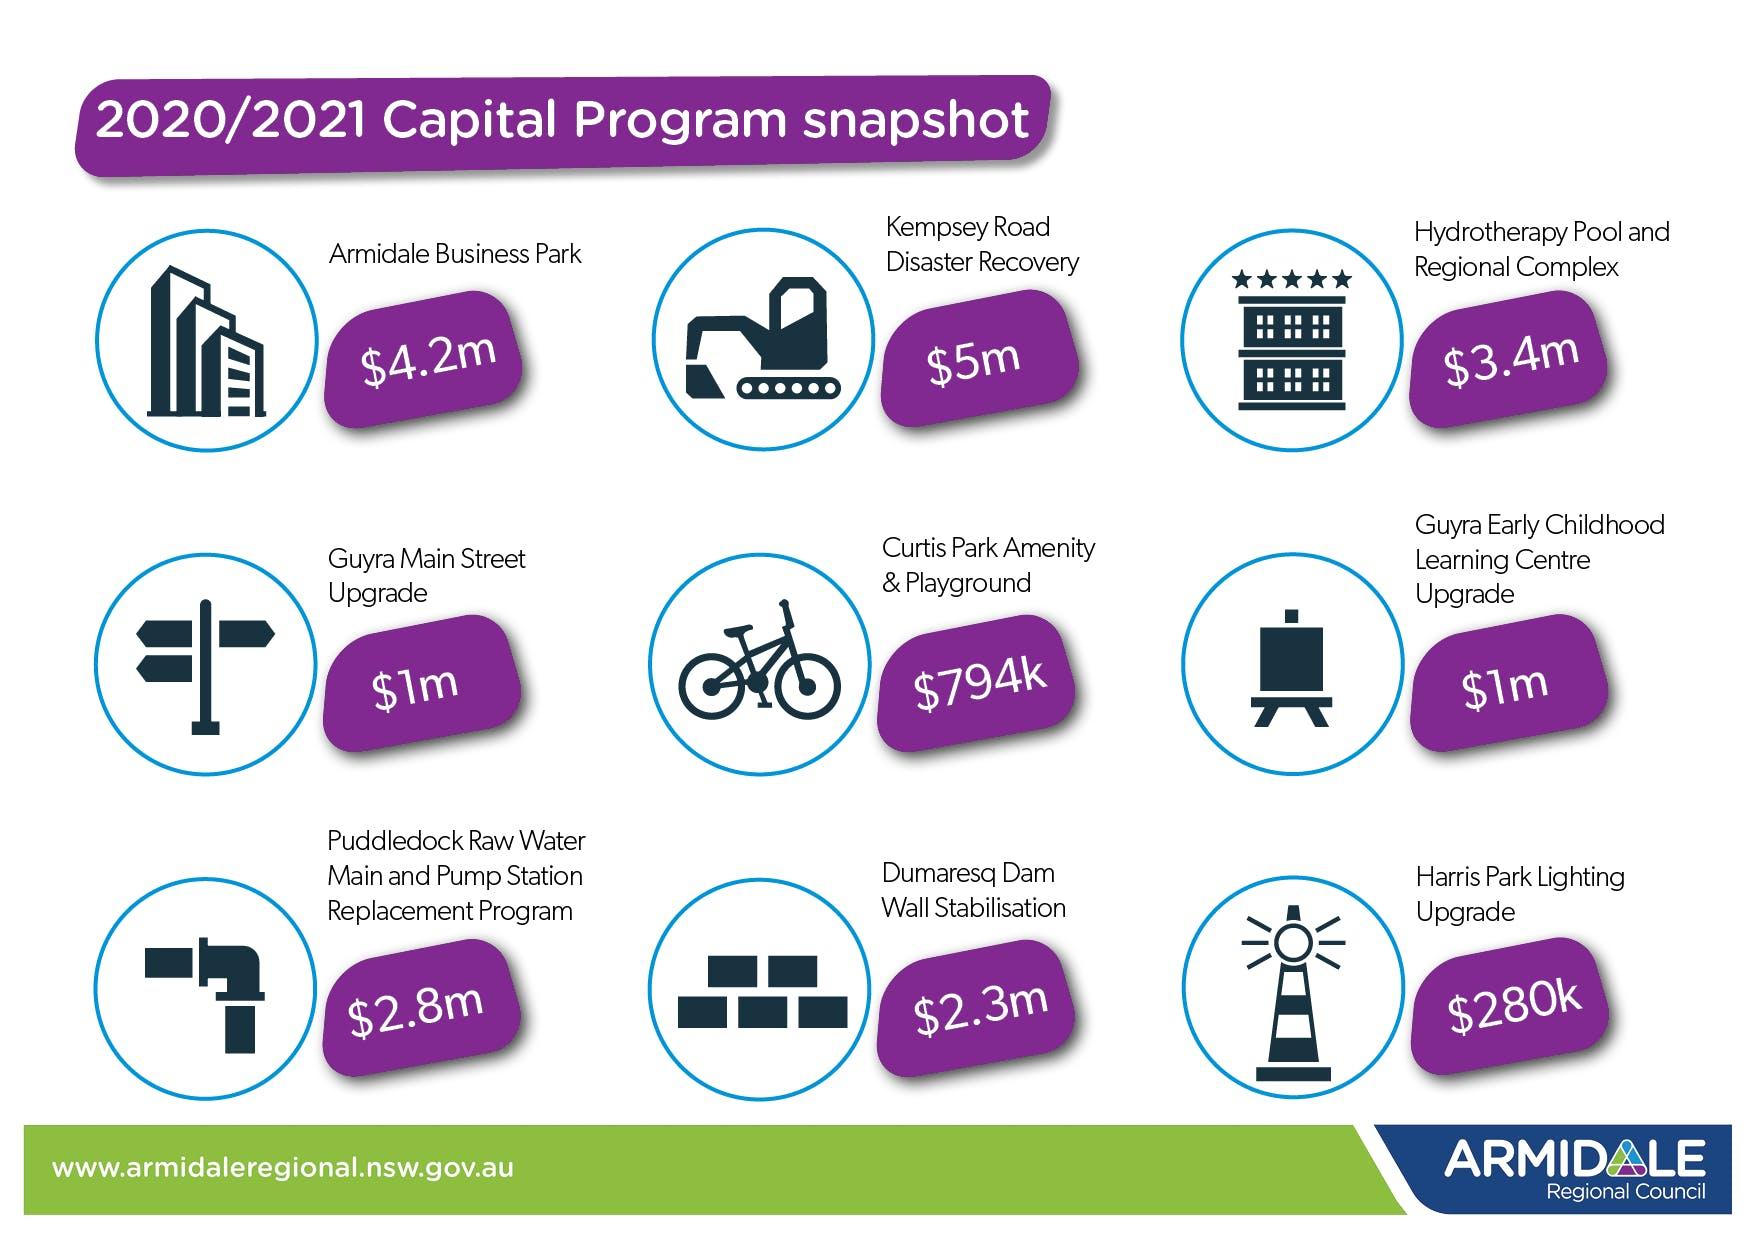 2020/2021 Capital Program snapshot